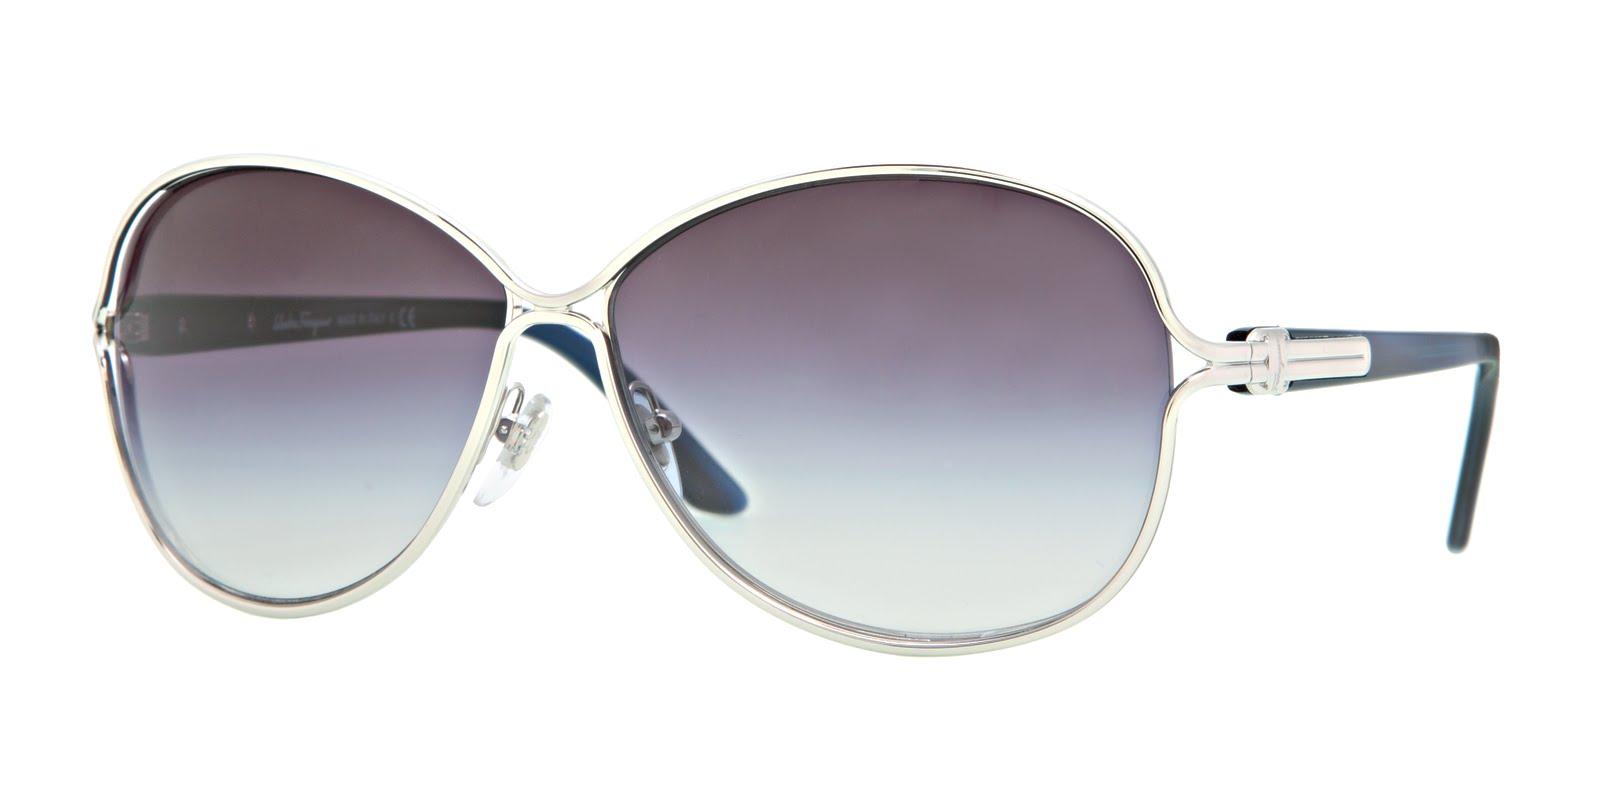 Las gafas de Salvatore Ferragamo!! / BLOG DA PIMPA